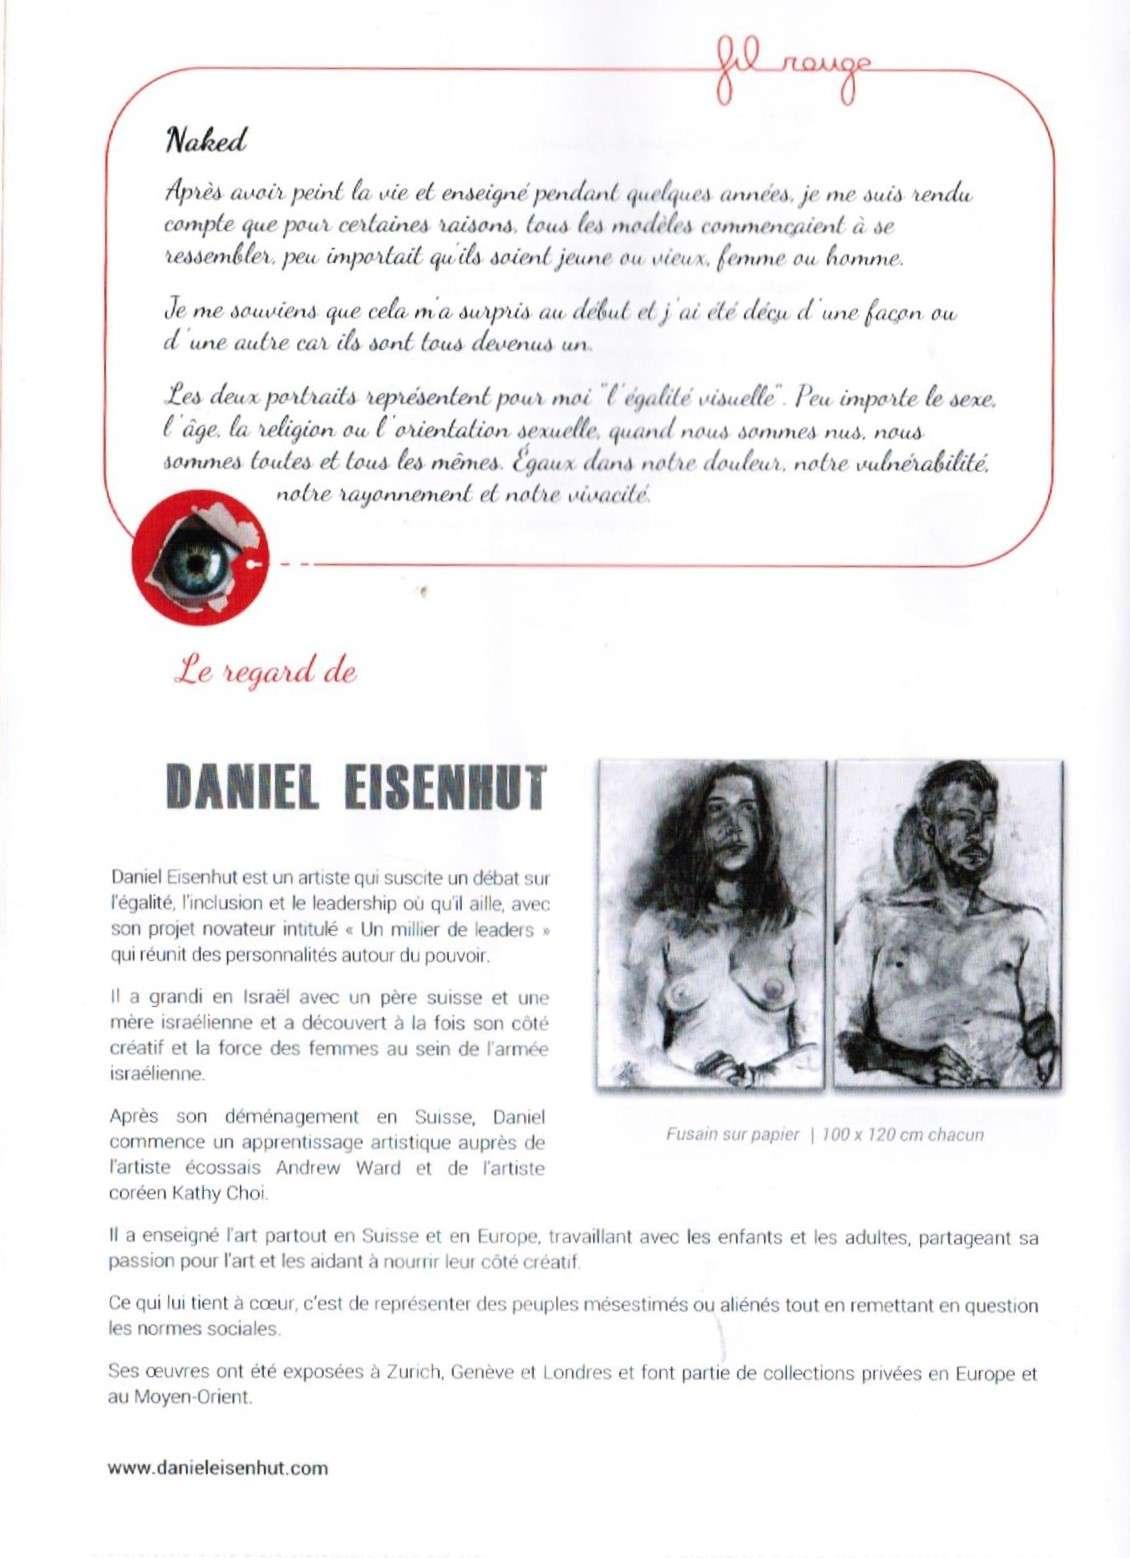 BPW - Daniel Eisenhut